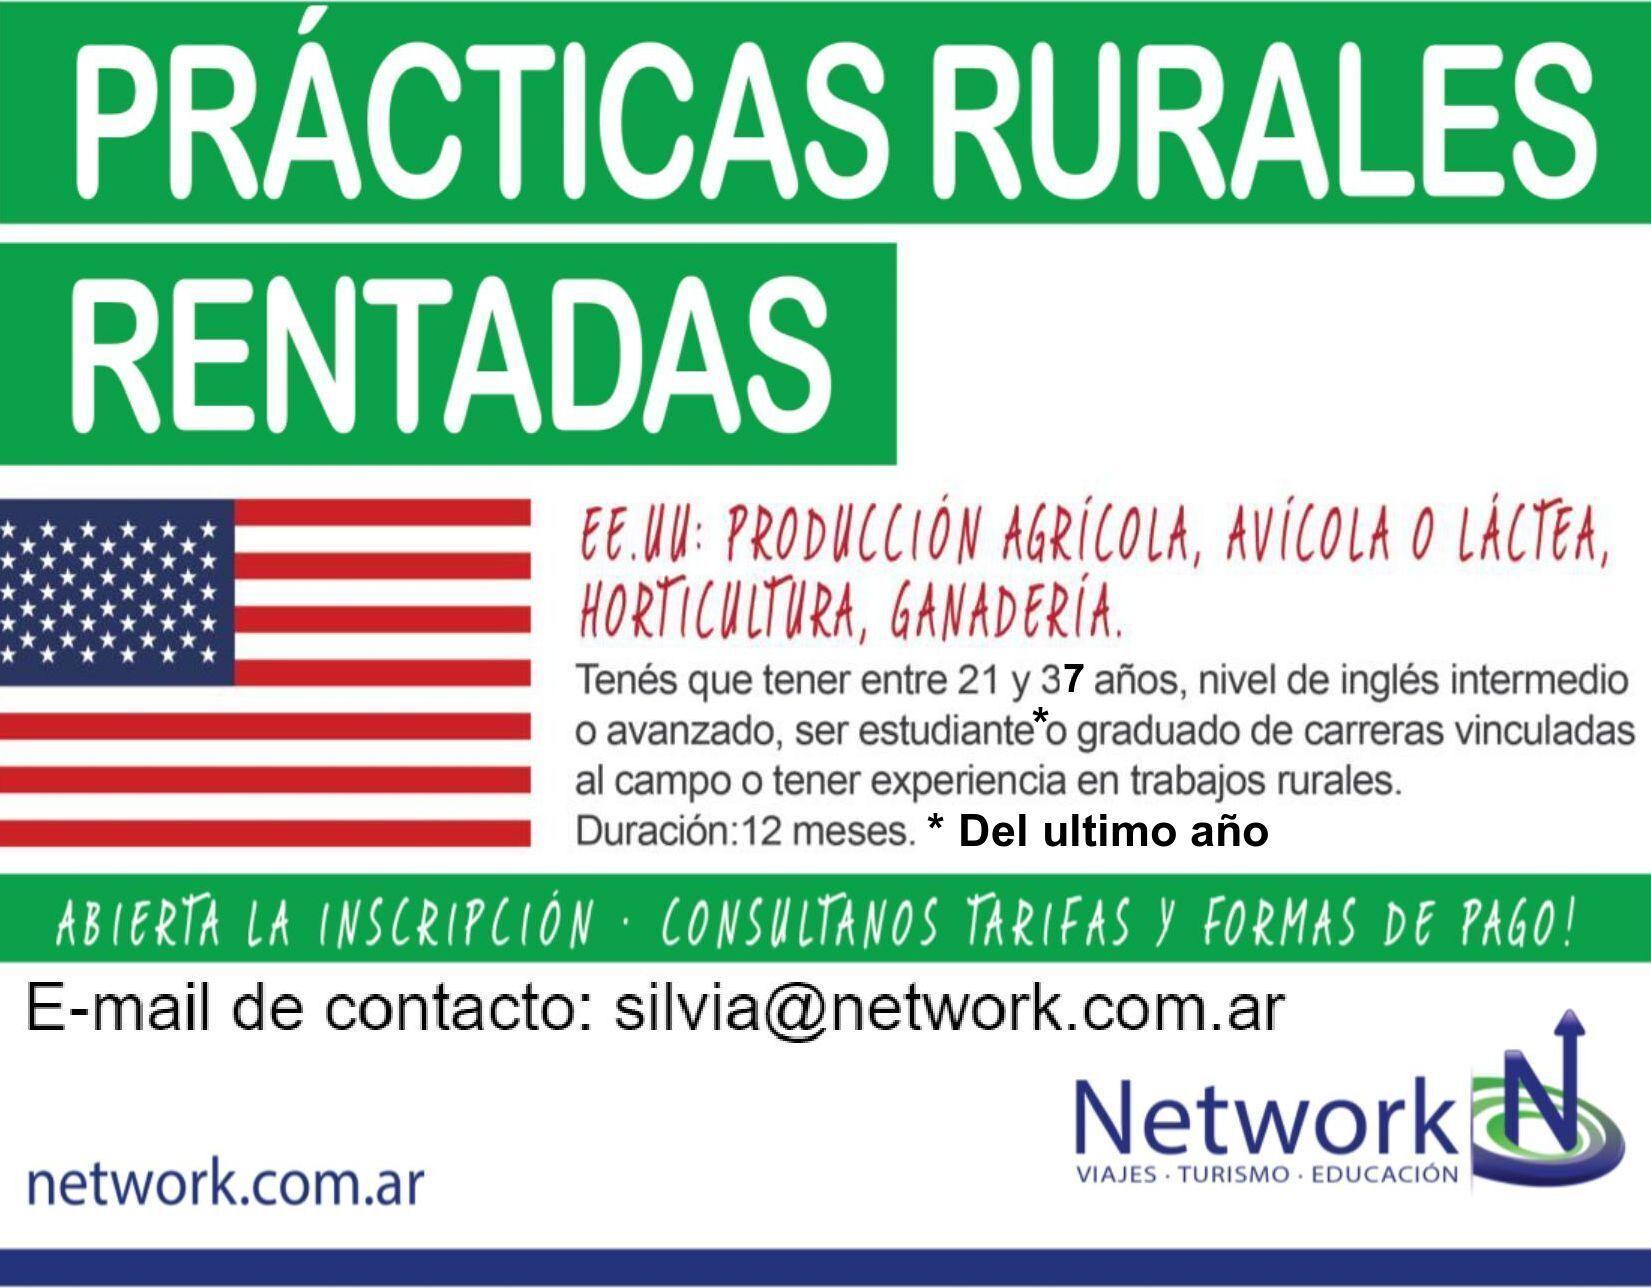 Practicas-Rurales-Rentadas-en-USA